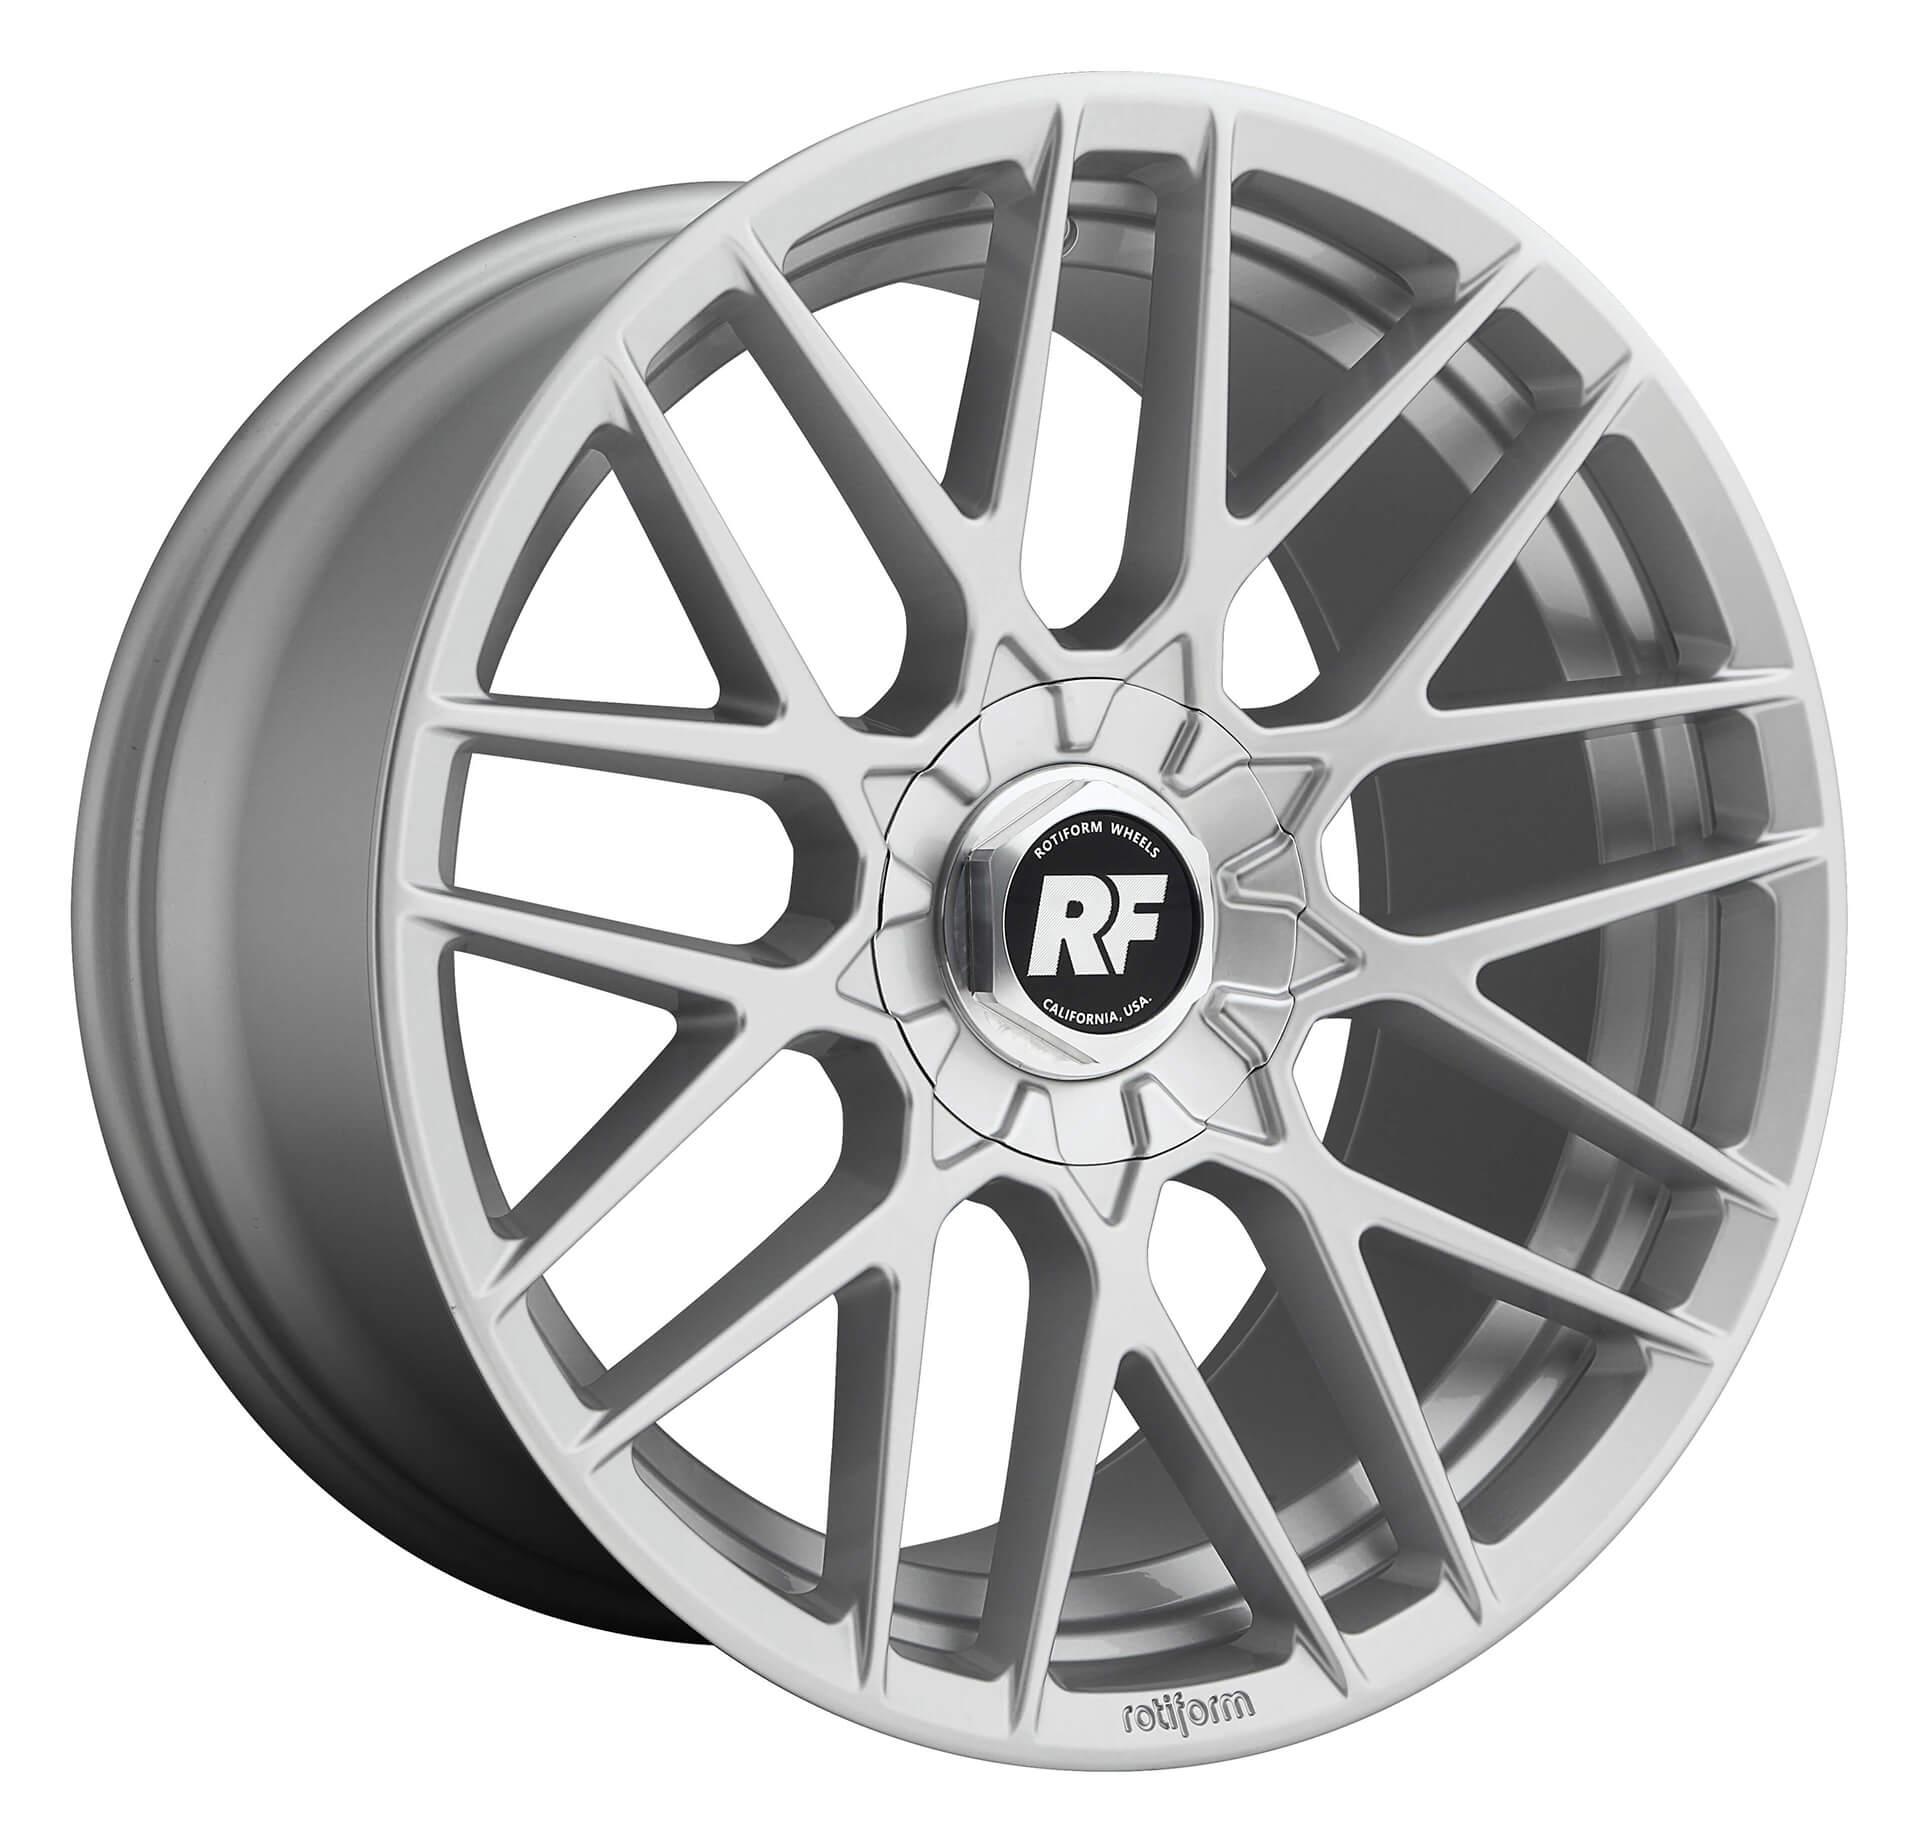 Rotiform Monoblock Wheel - RSE Cast 1 Piece